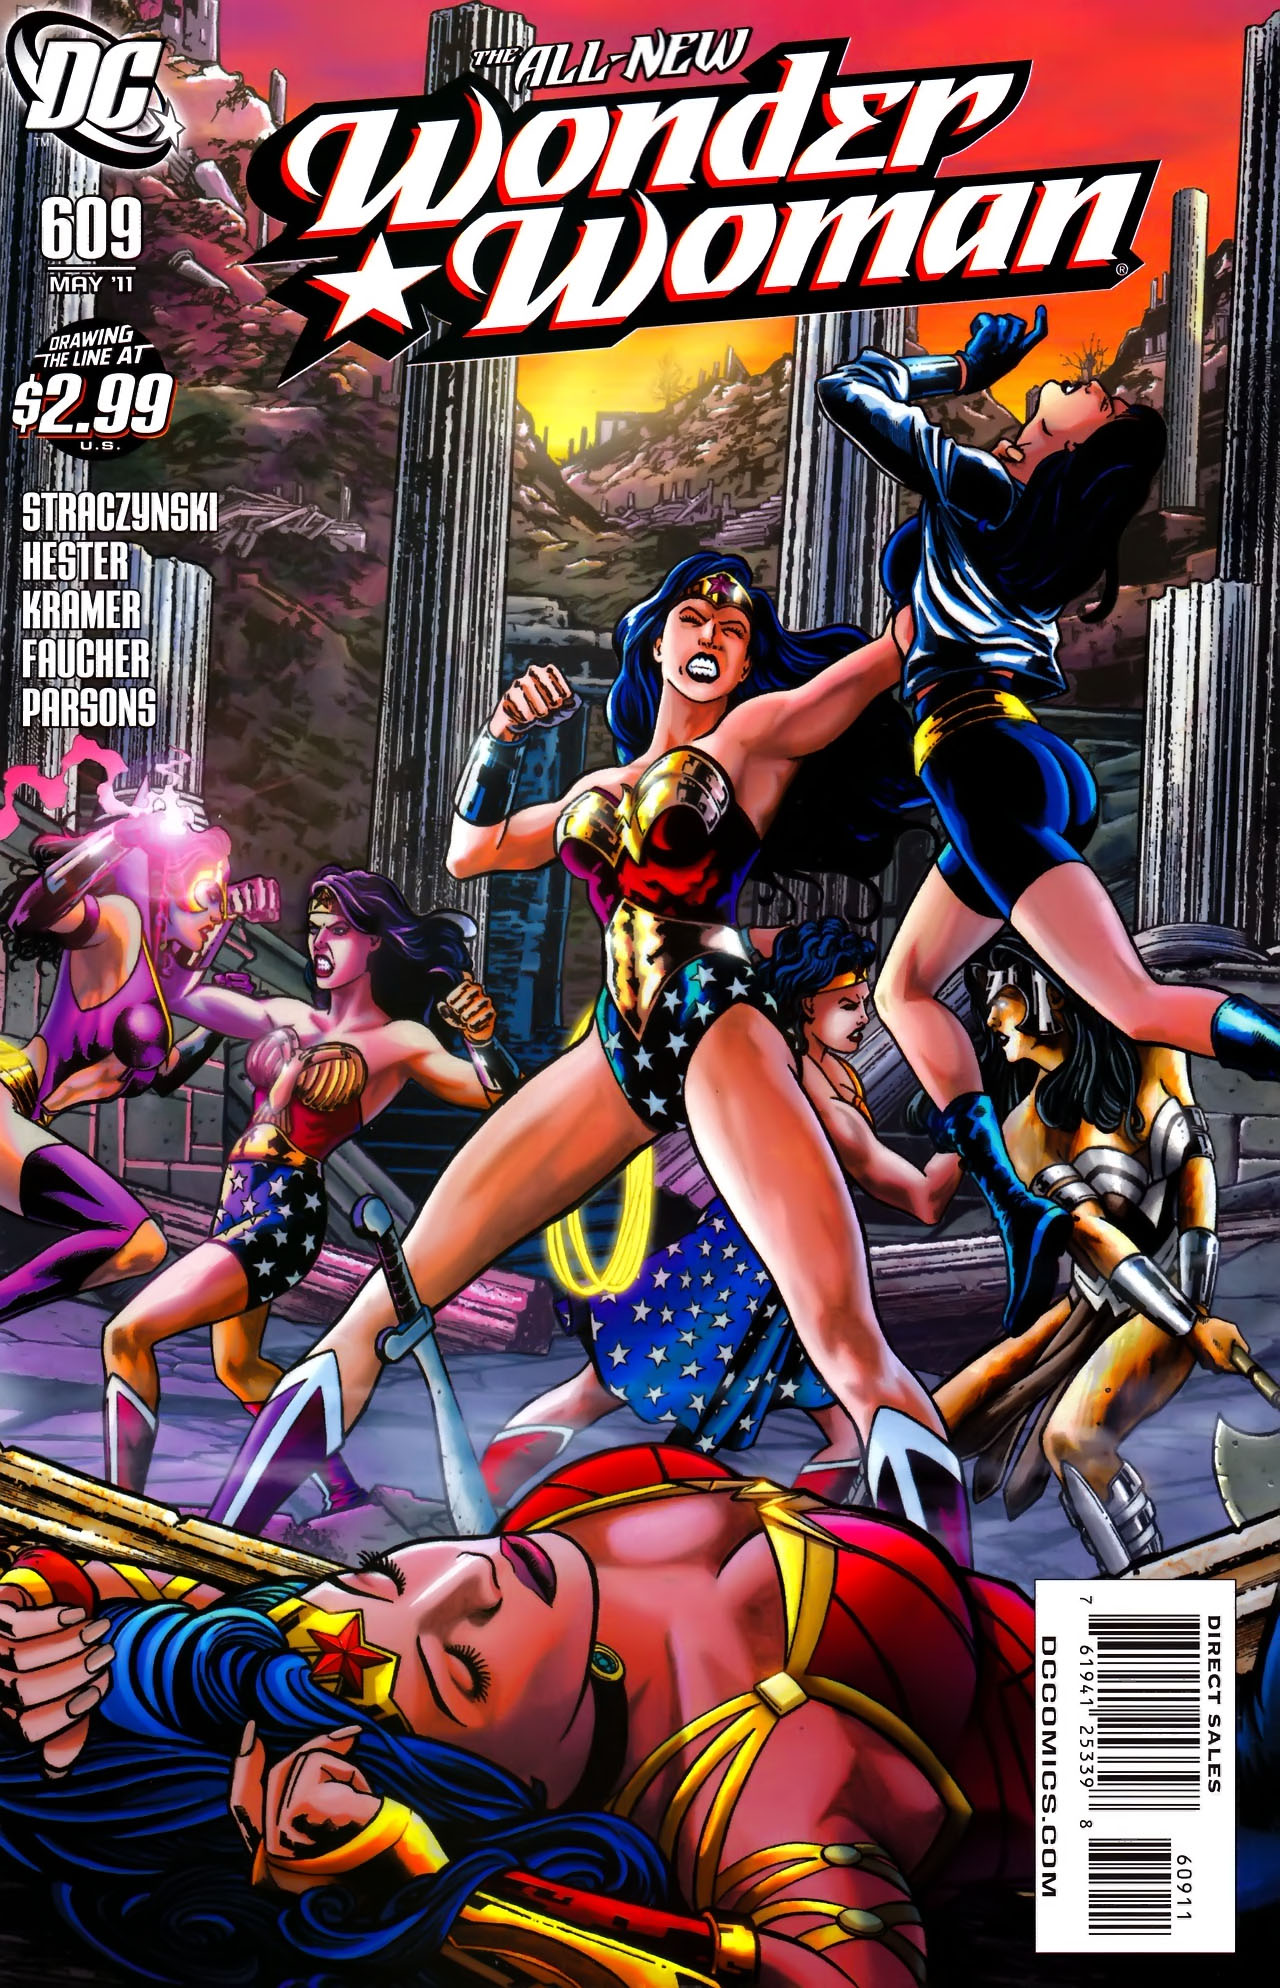 Read online Wonder Woman (2006) comic -  Issue #609 - 1